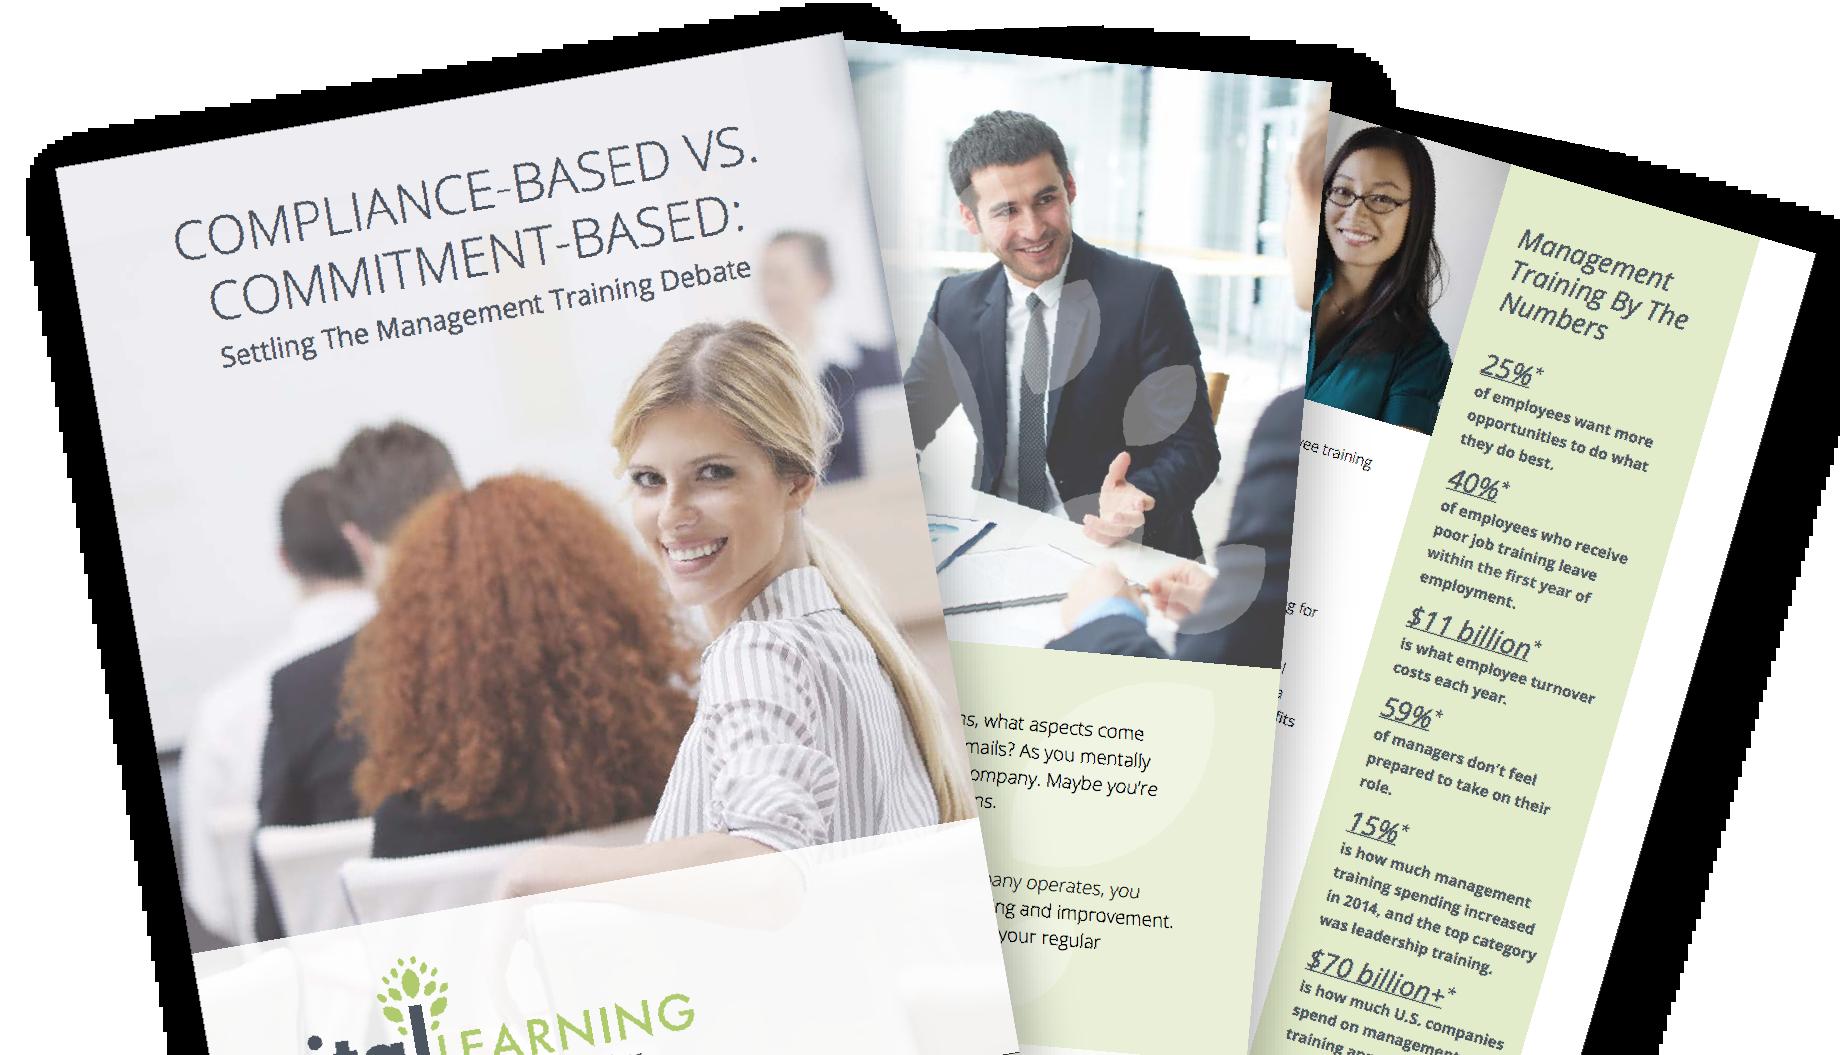 Compliance-Based-vs-Commitment-Based-mockup.png